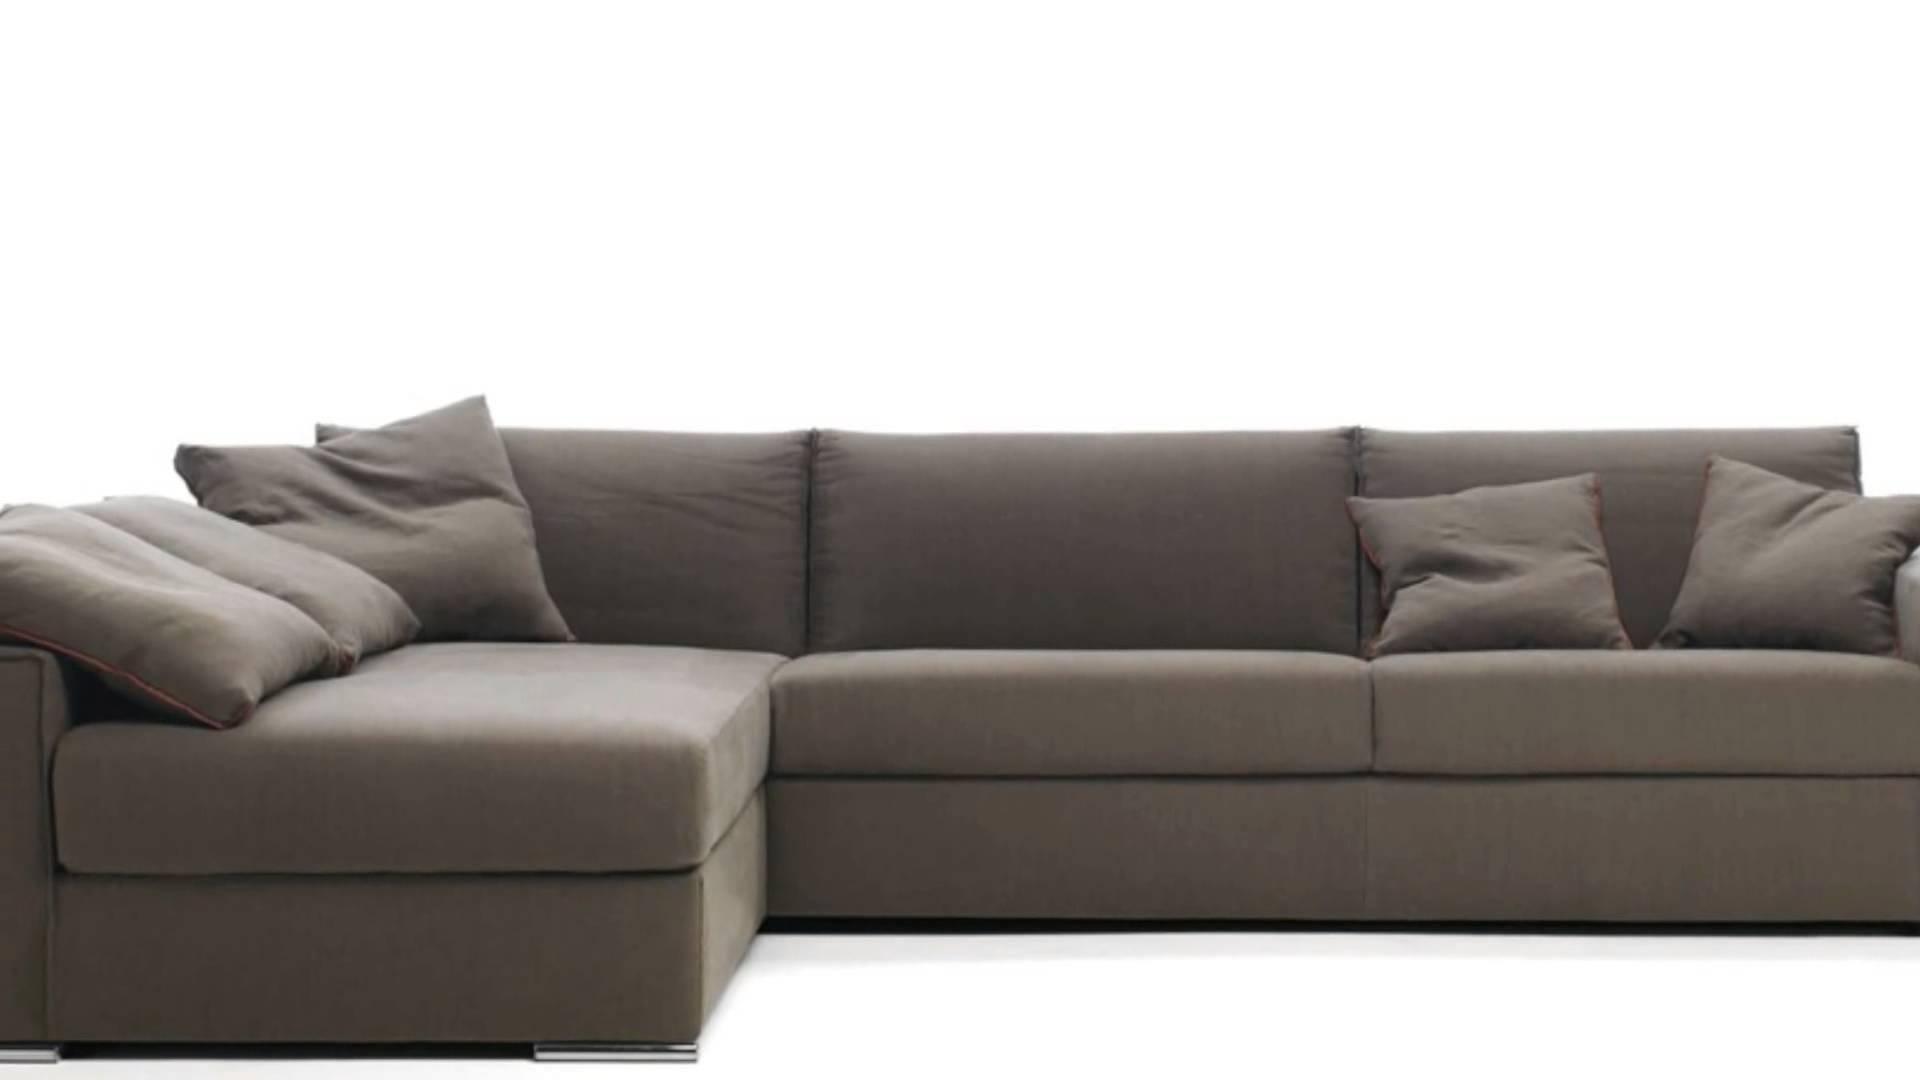 Aifaresidency Throughout Most Popular Modern Sofas (View 17 of 20)